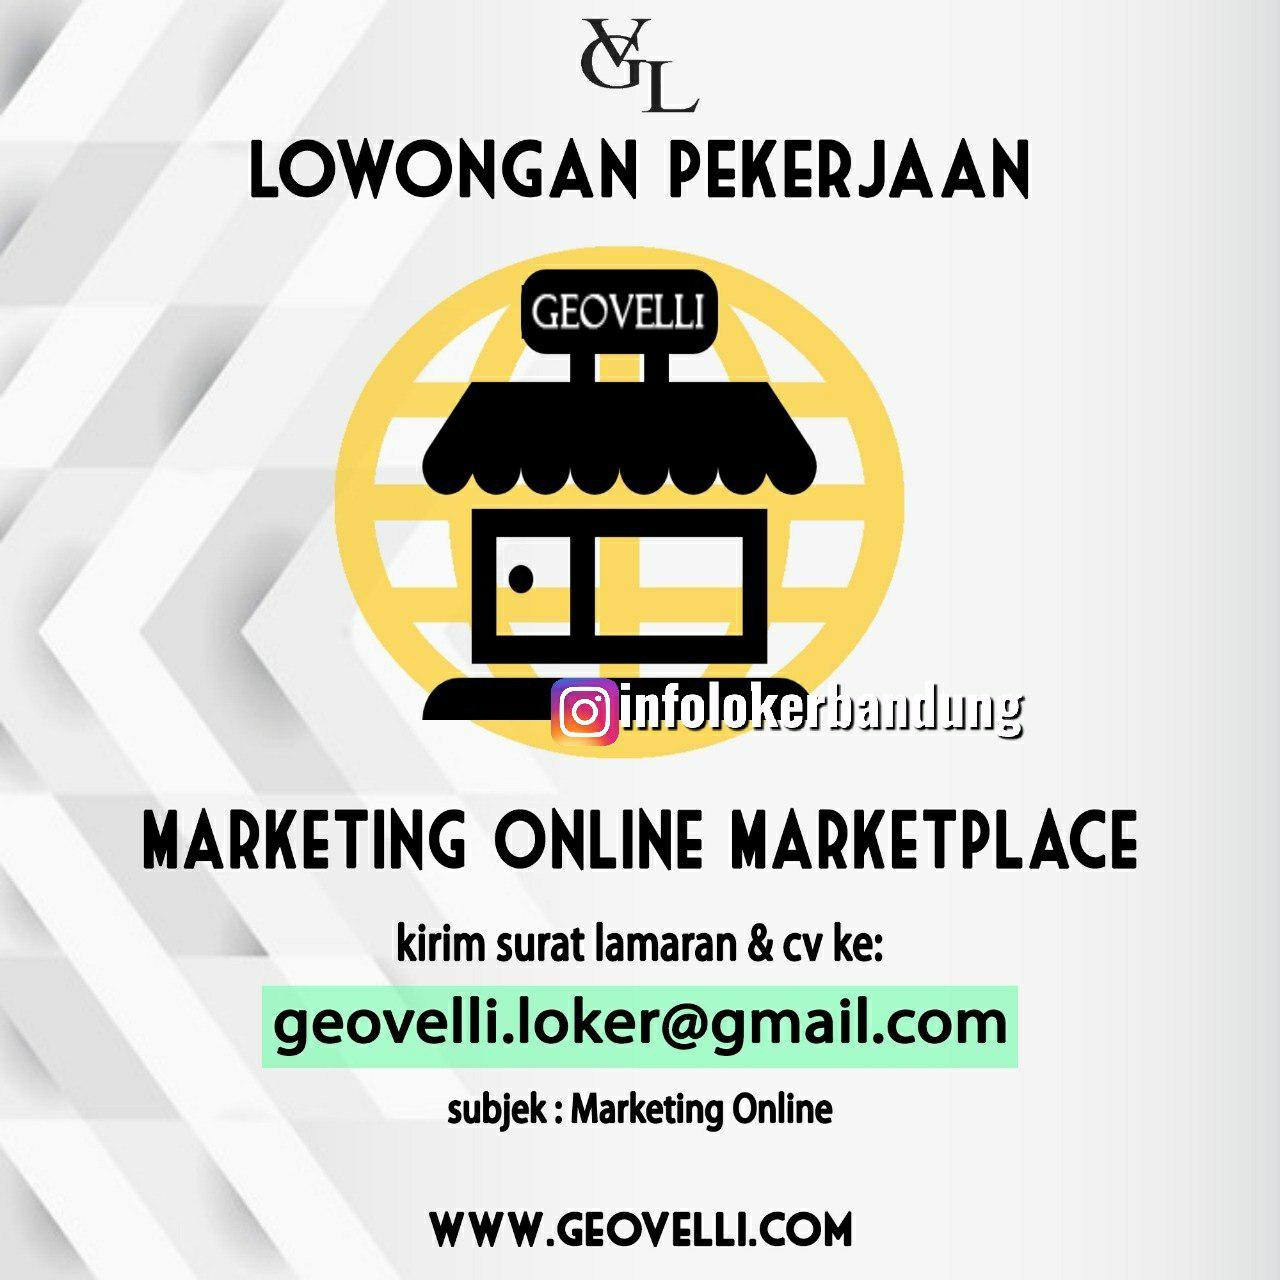 Lowongan Kerja Geovelli Bandung Juli 2019